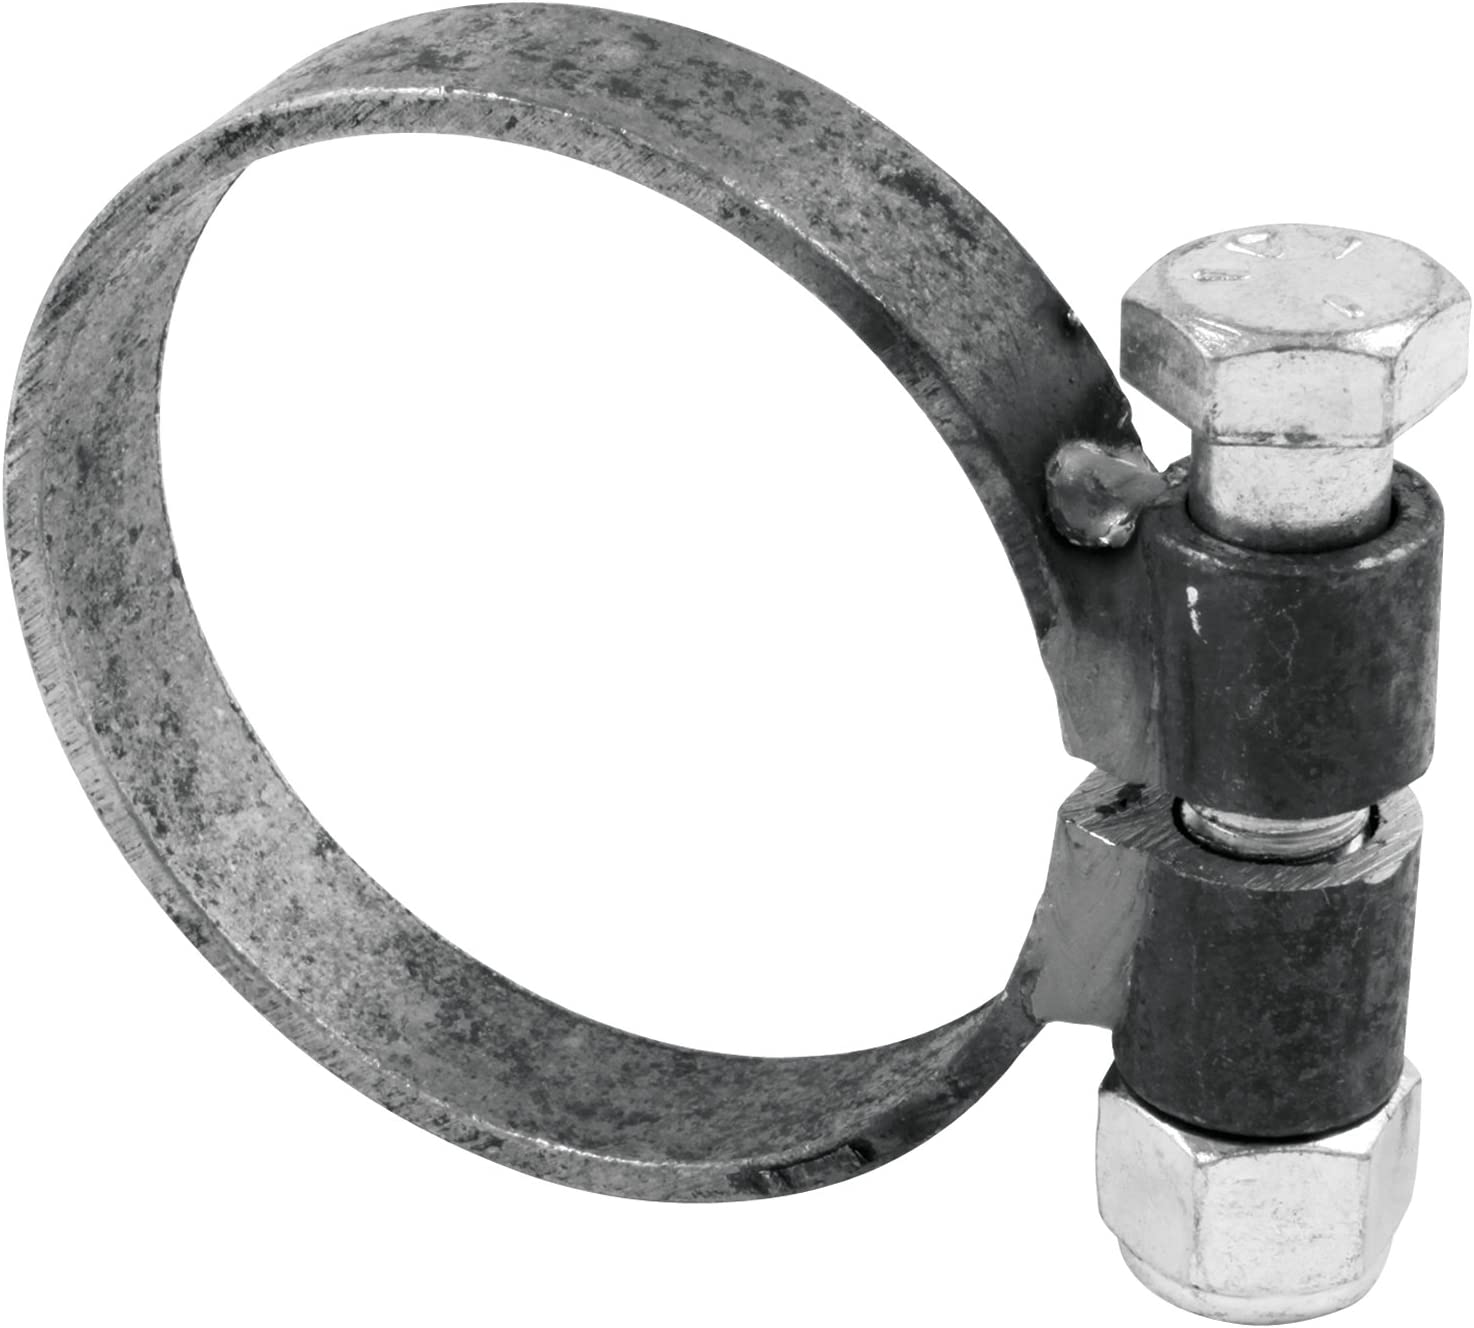 Allstar ALL60143 5//8 Wide Steel 1-Bolt Design Clamp-On Ring for 3 Axle Tube